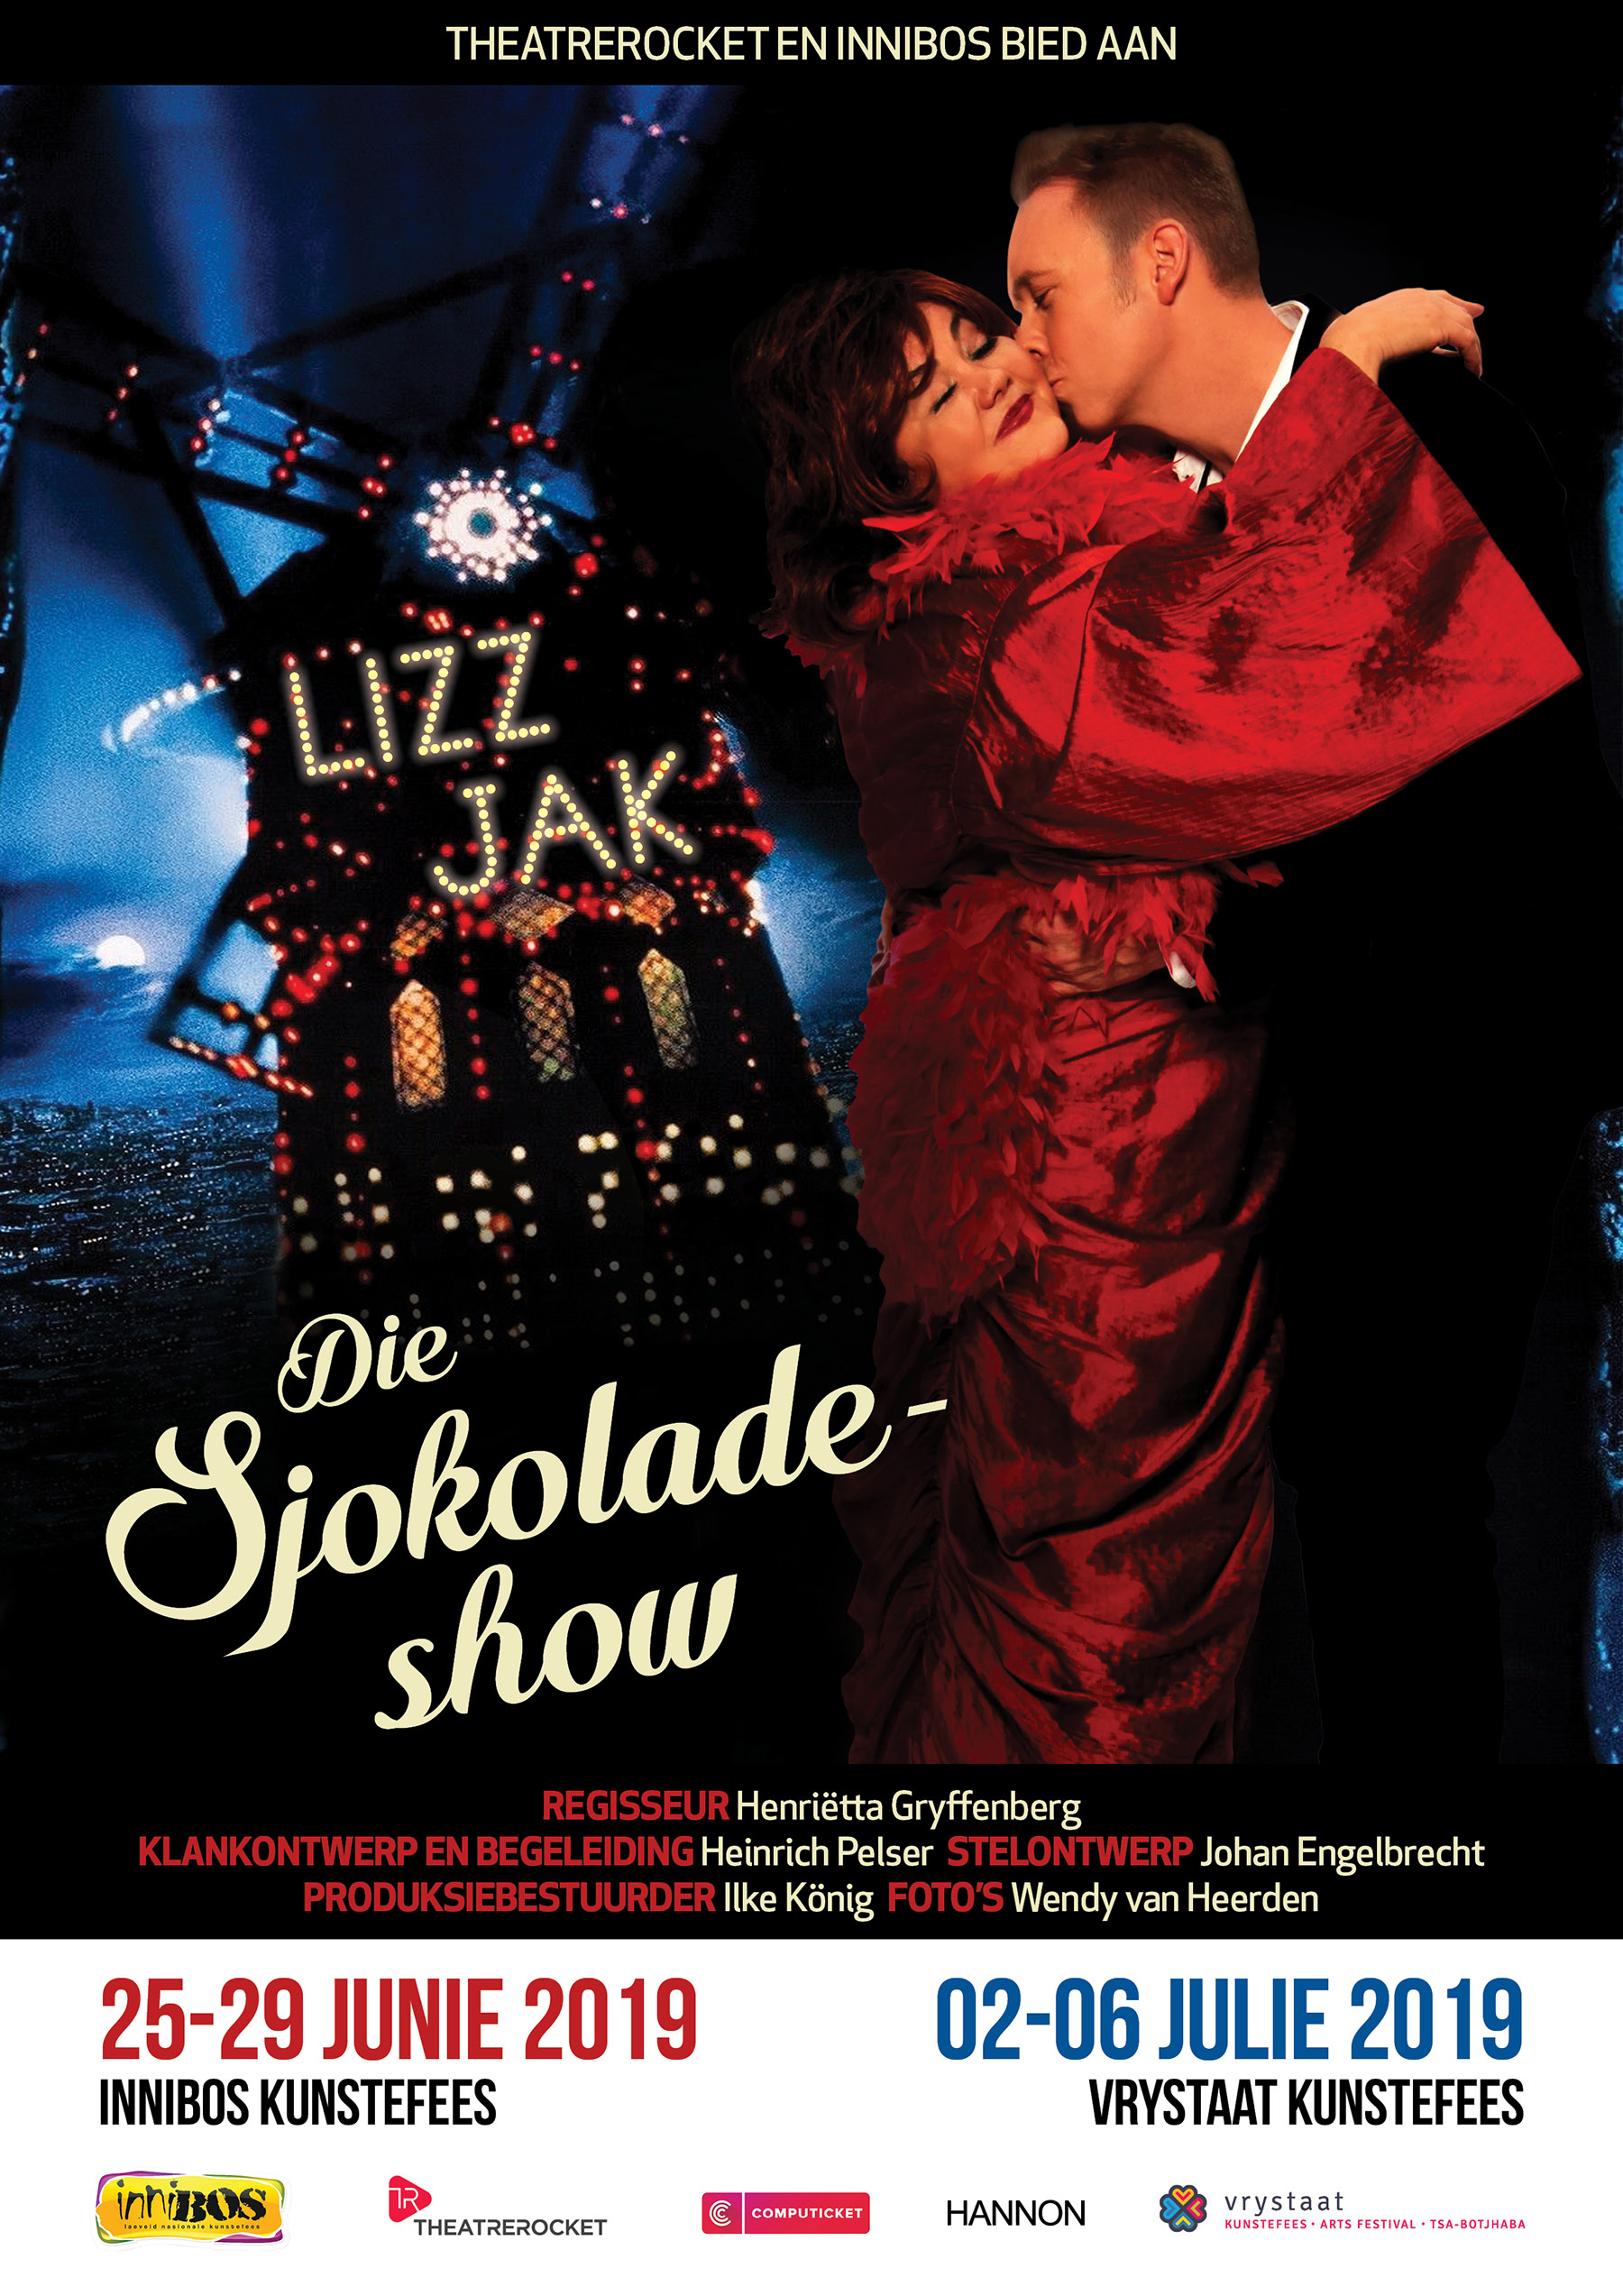 Moulin Rouge sjok plakkaat Innibos en Vryfees-s (002)